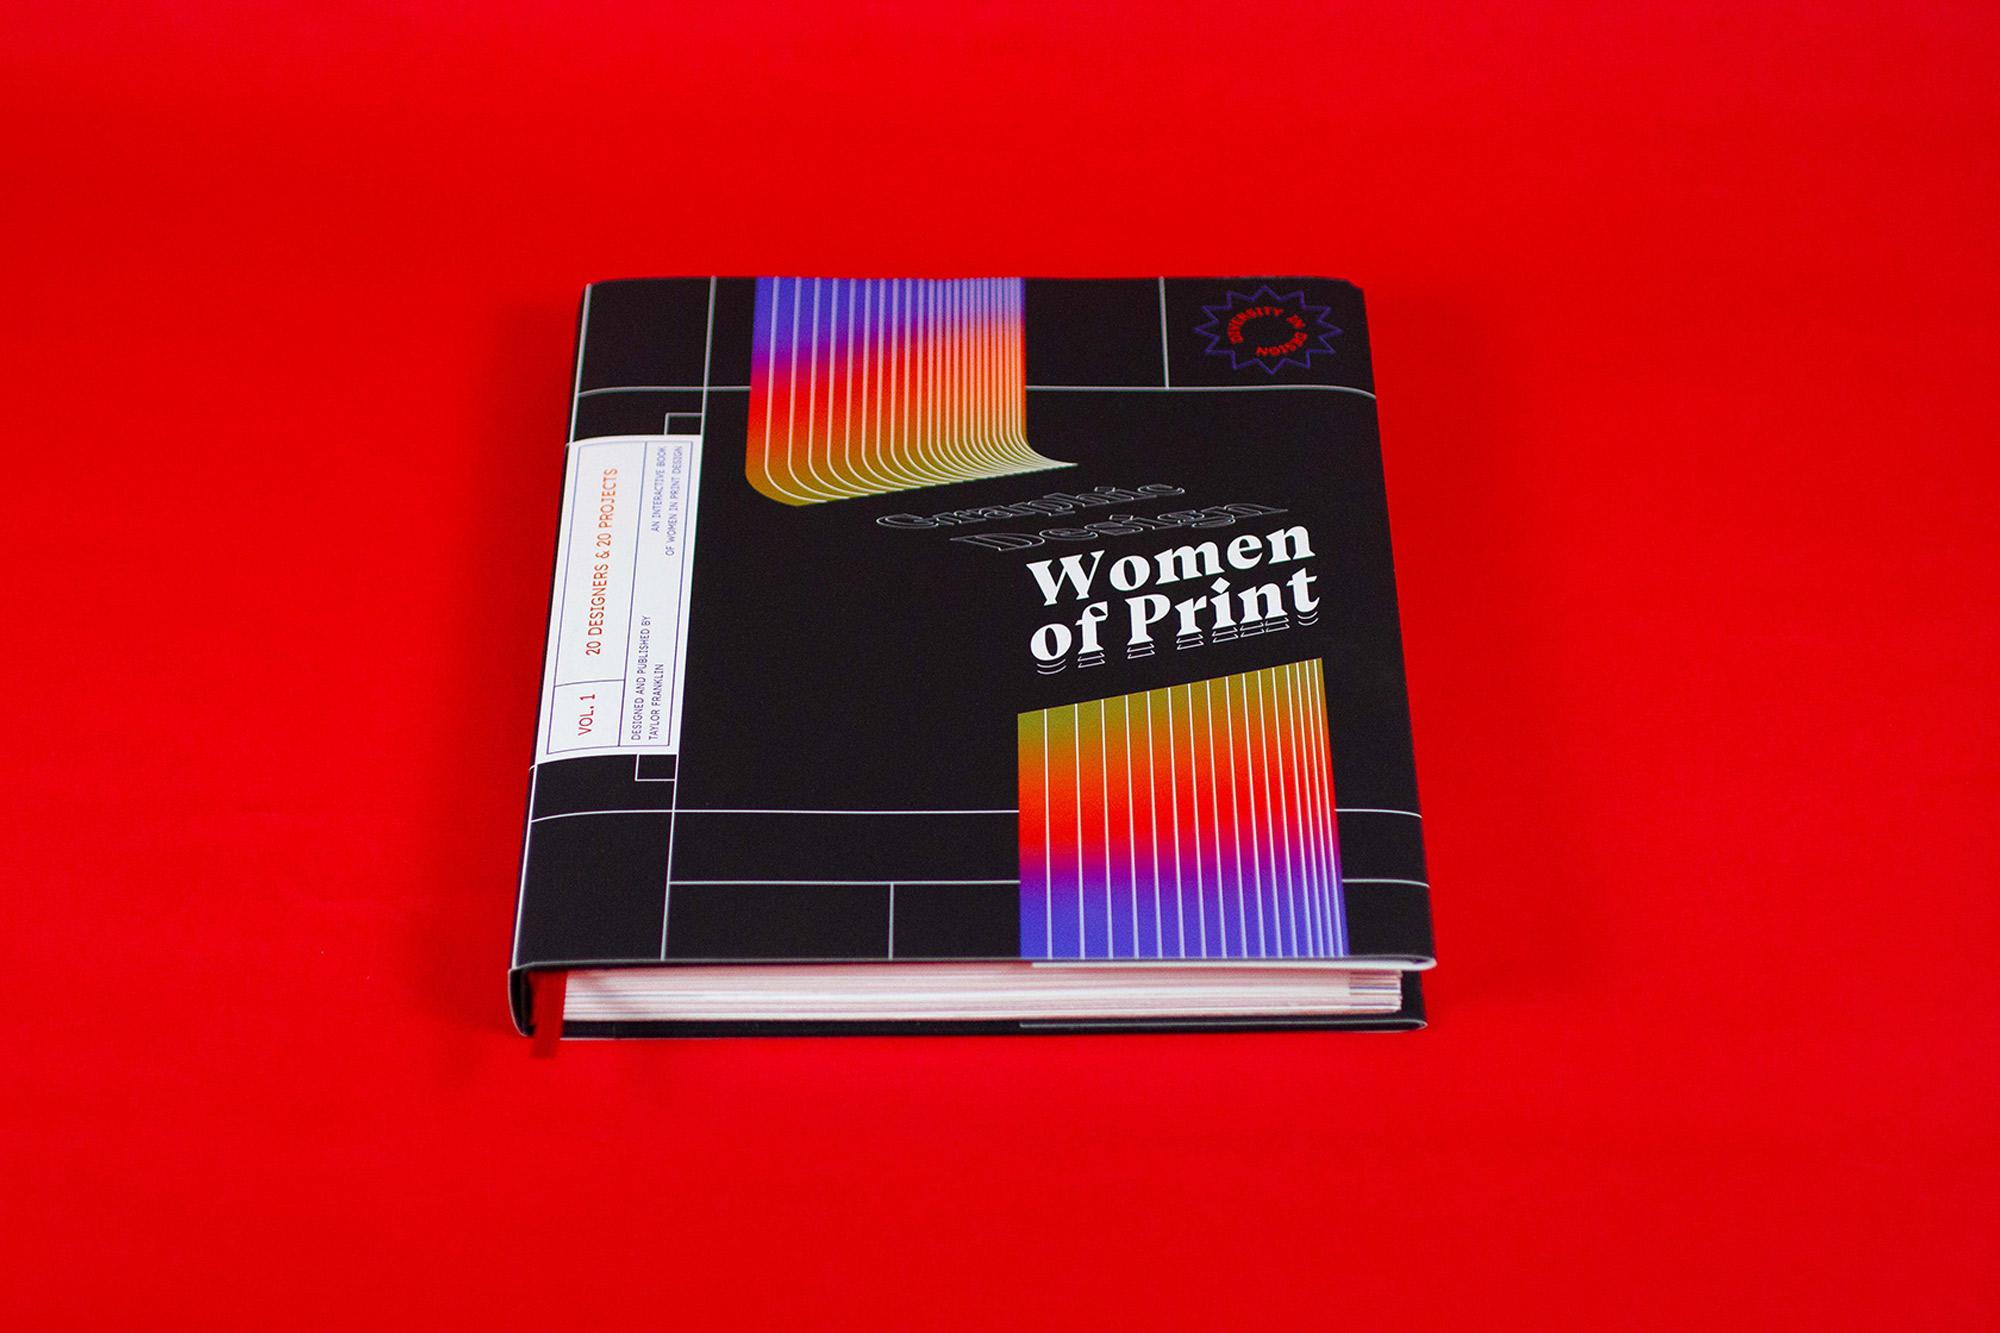 Women of Print